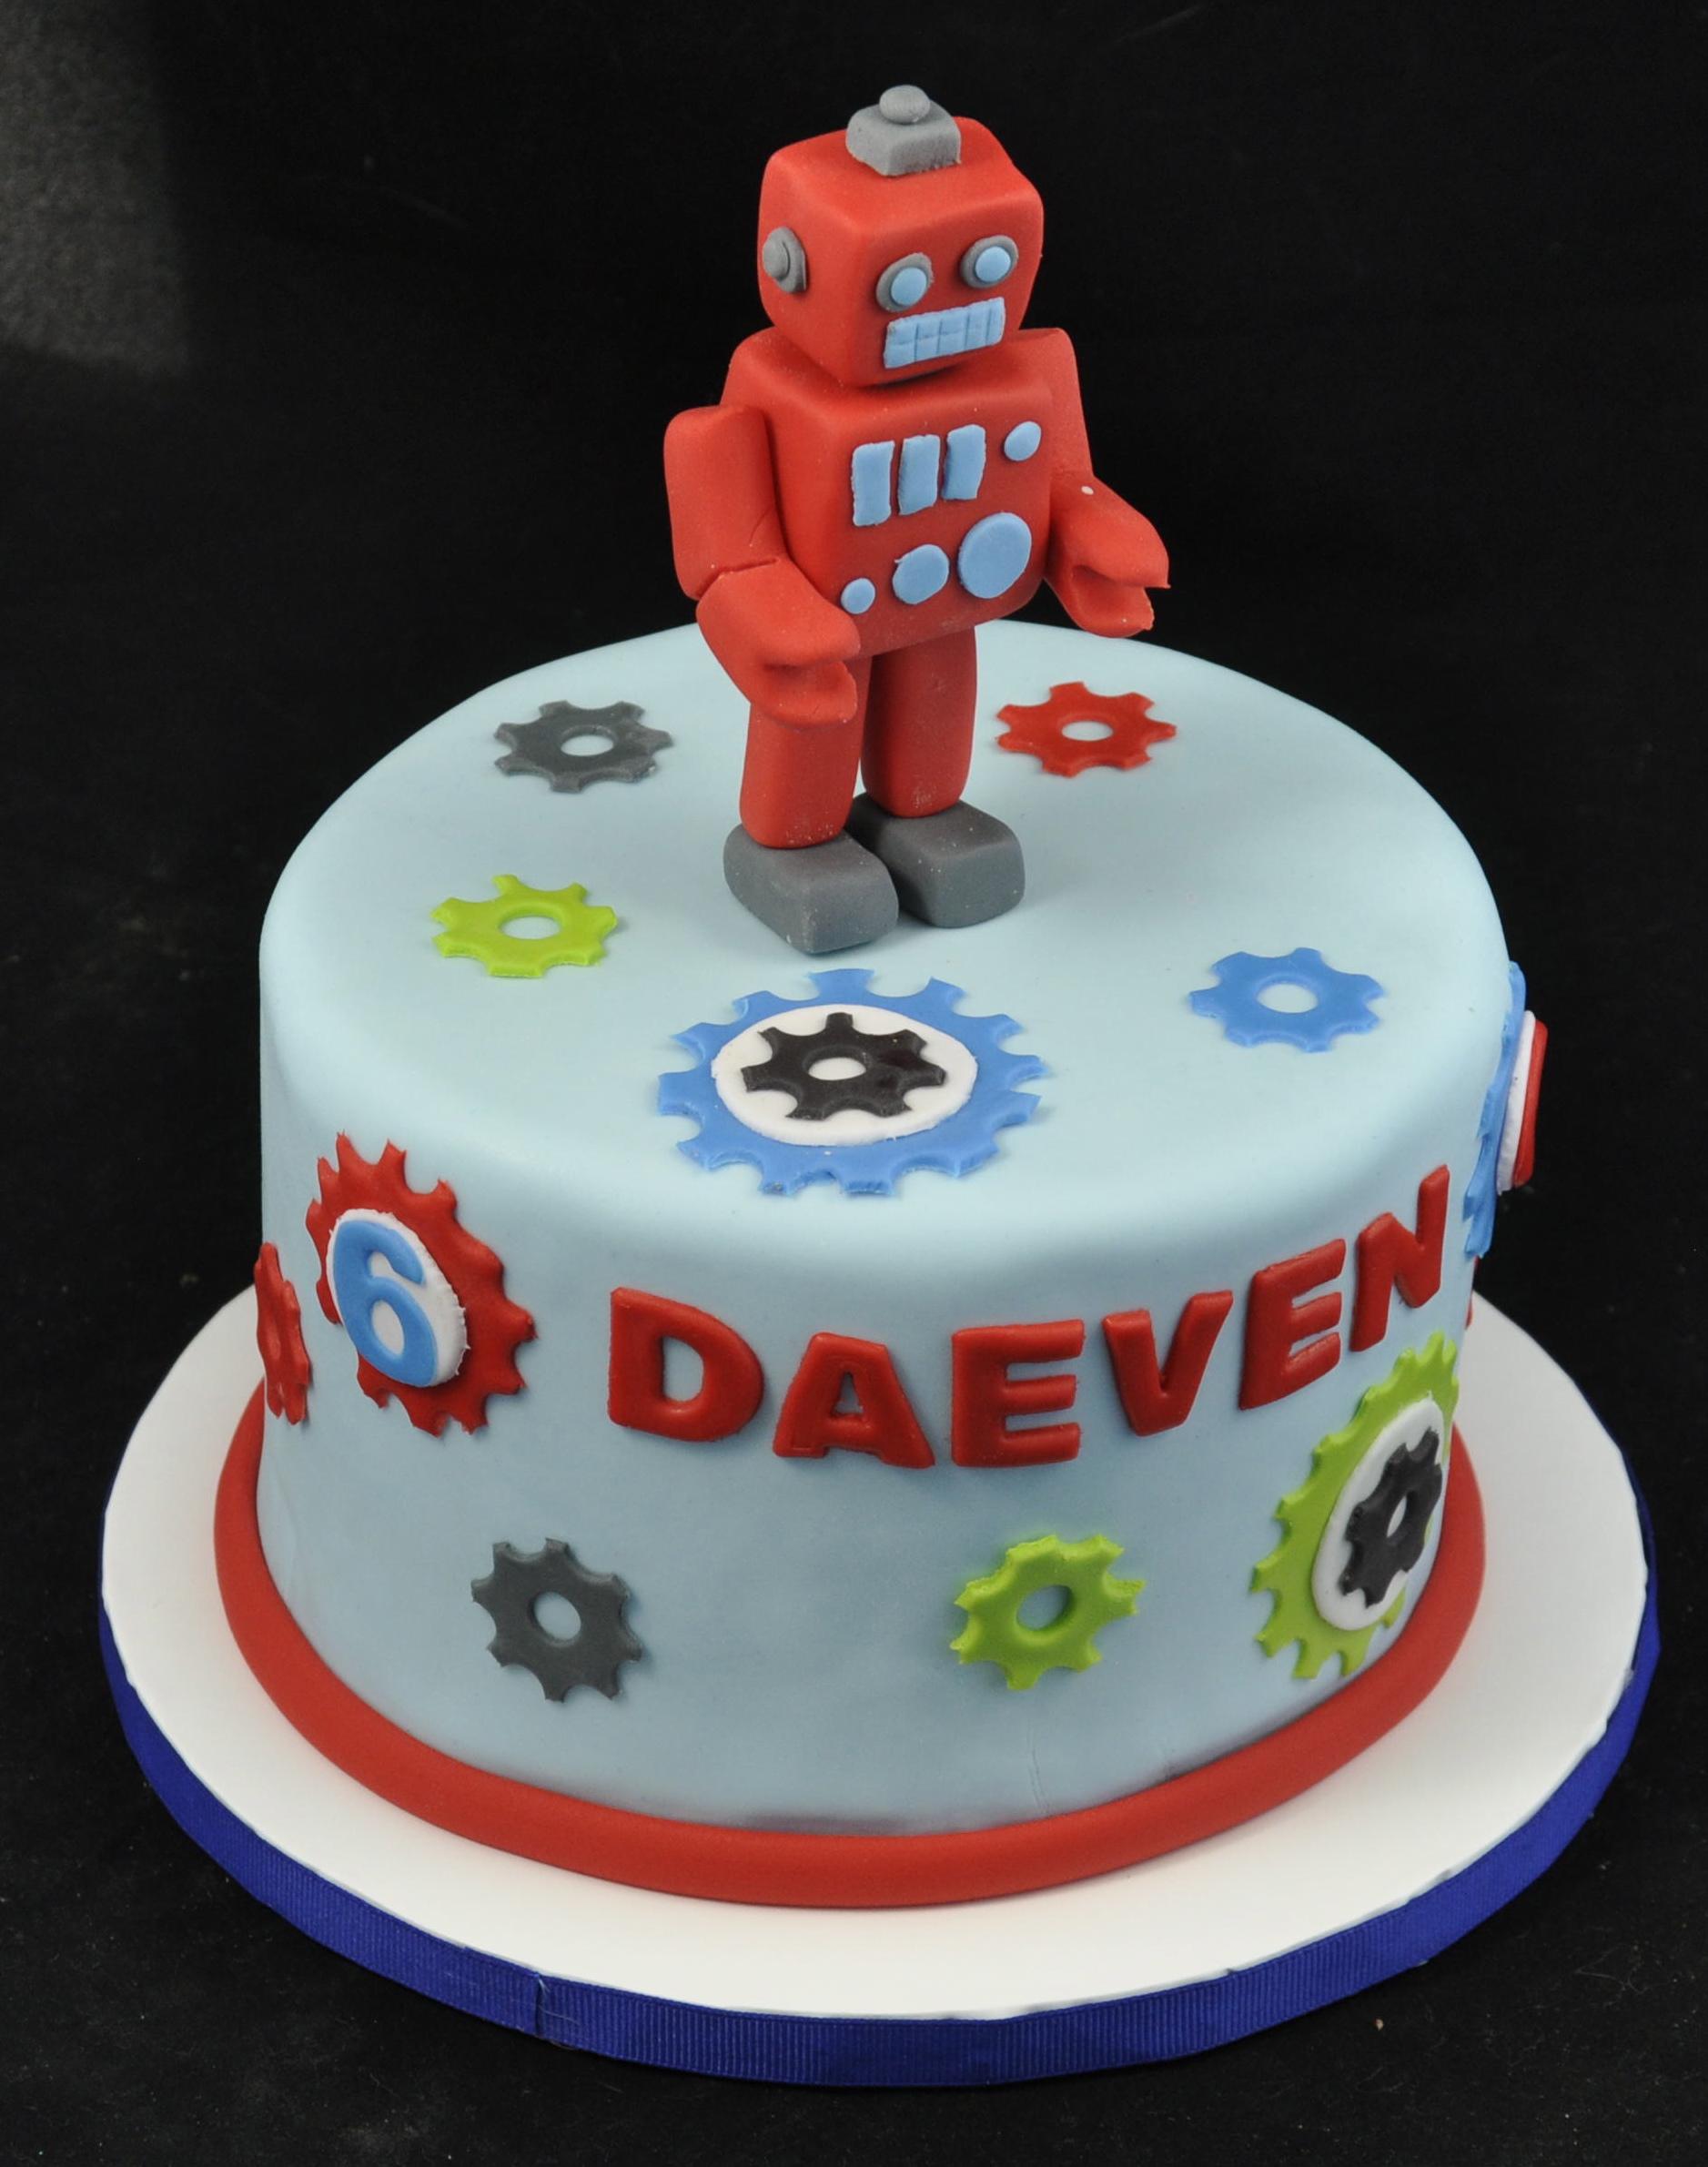 Astonishing Robot Cake Decoration Ideas Little Birthday Cakes Funny Birthday Cards Online Alyptdamsfinfo